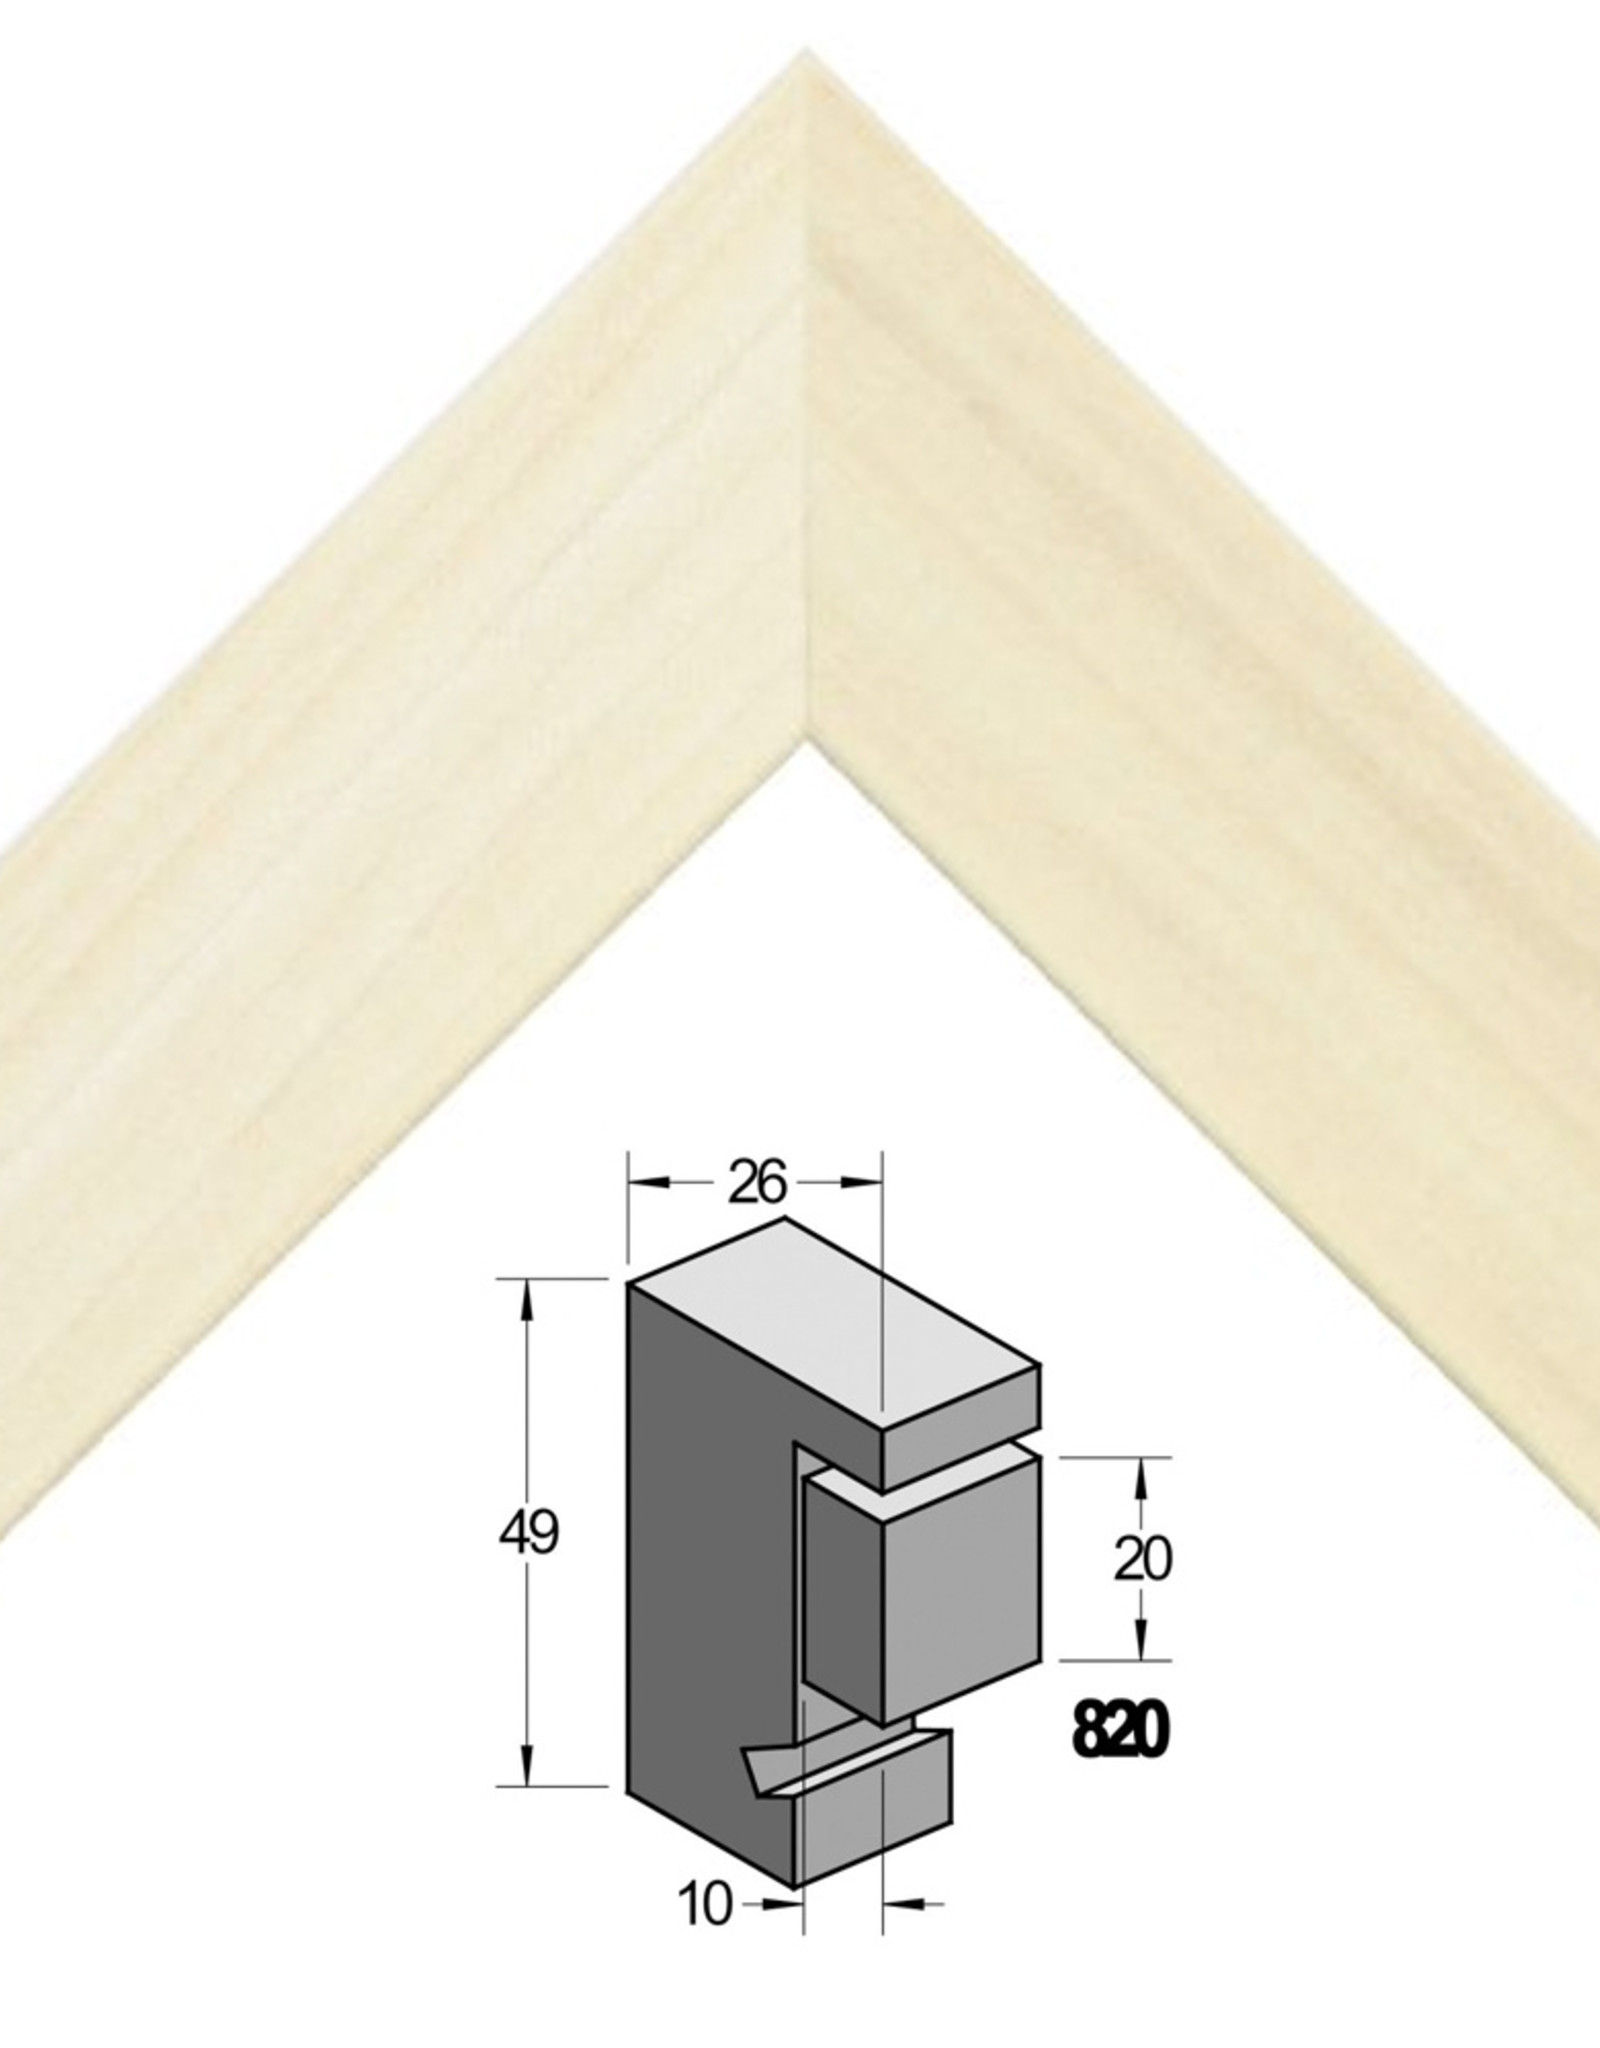 Barth 4x Wissellijst Verdiept 80x110cm Populier Ongelakt Barth profiel 26x49mm(820) sponning 20mm